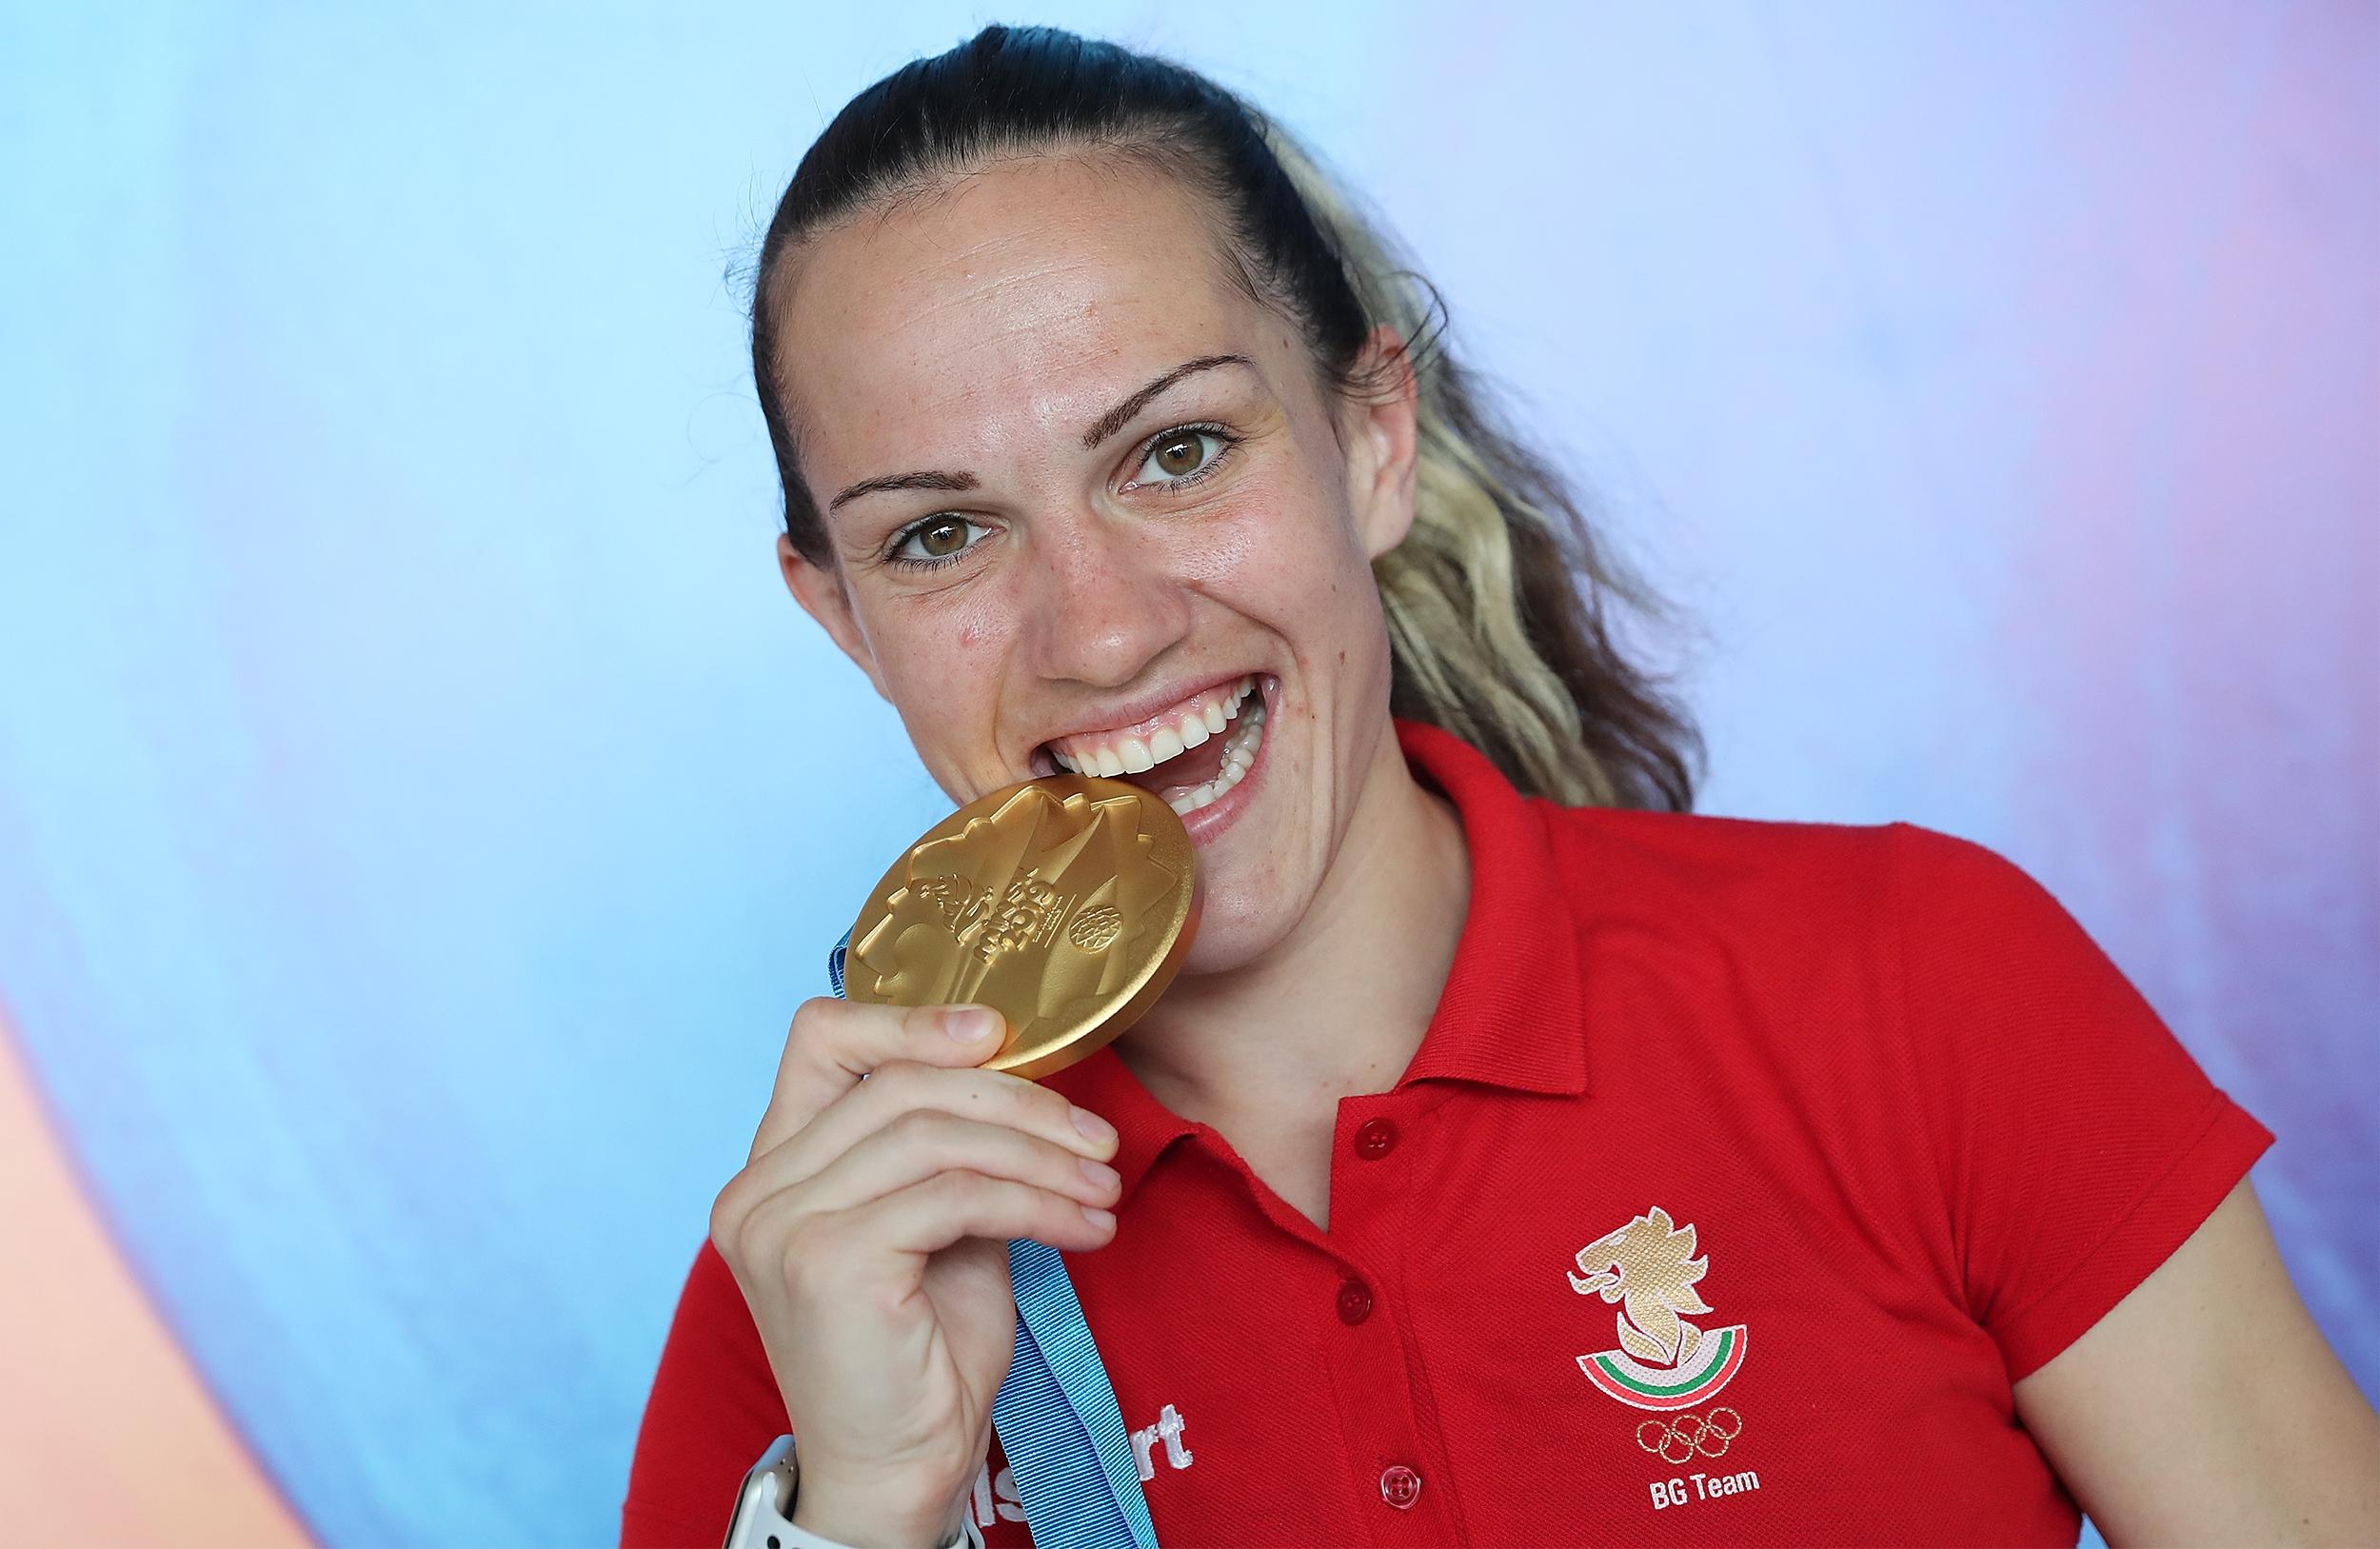 Станимира Петрова спечели златния медал в категория до 57 килограма